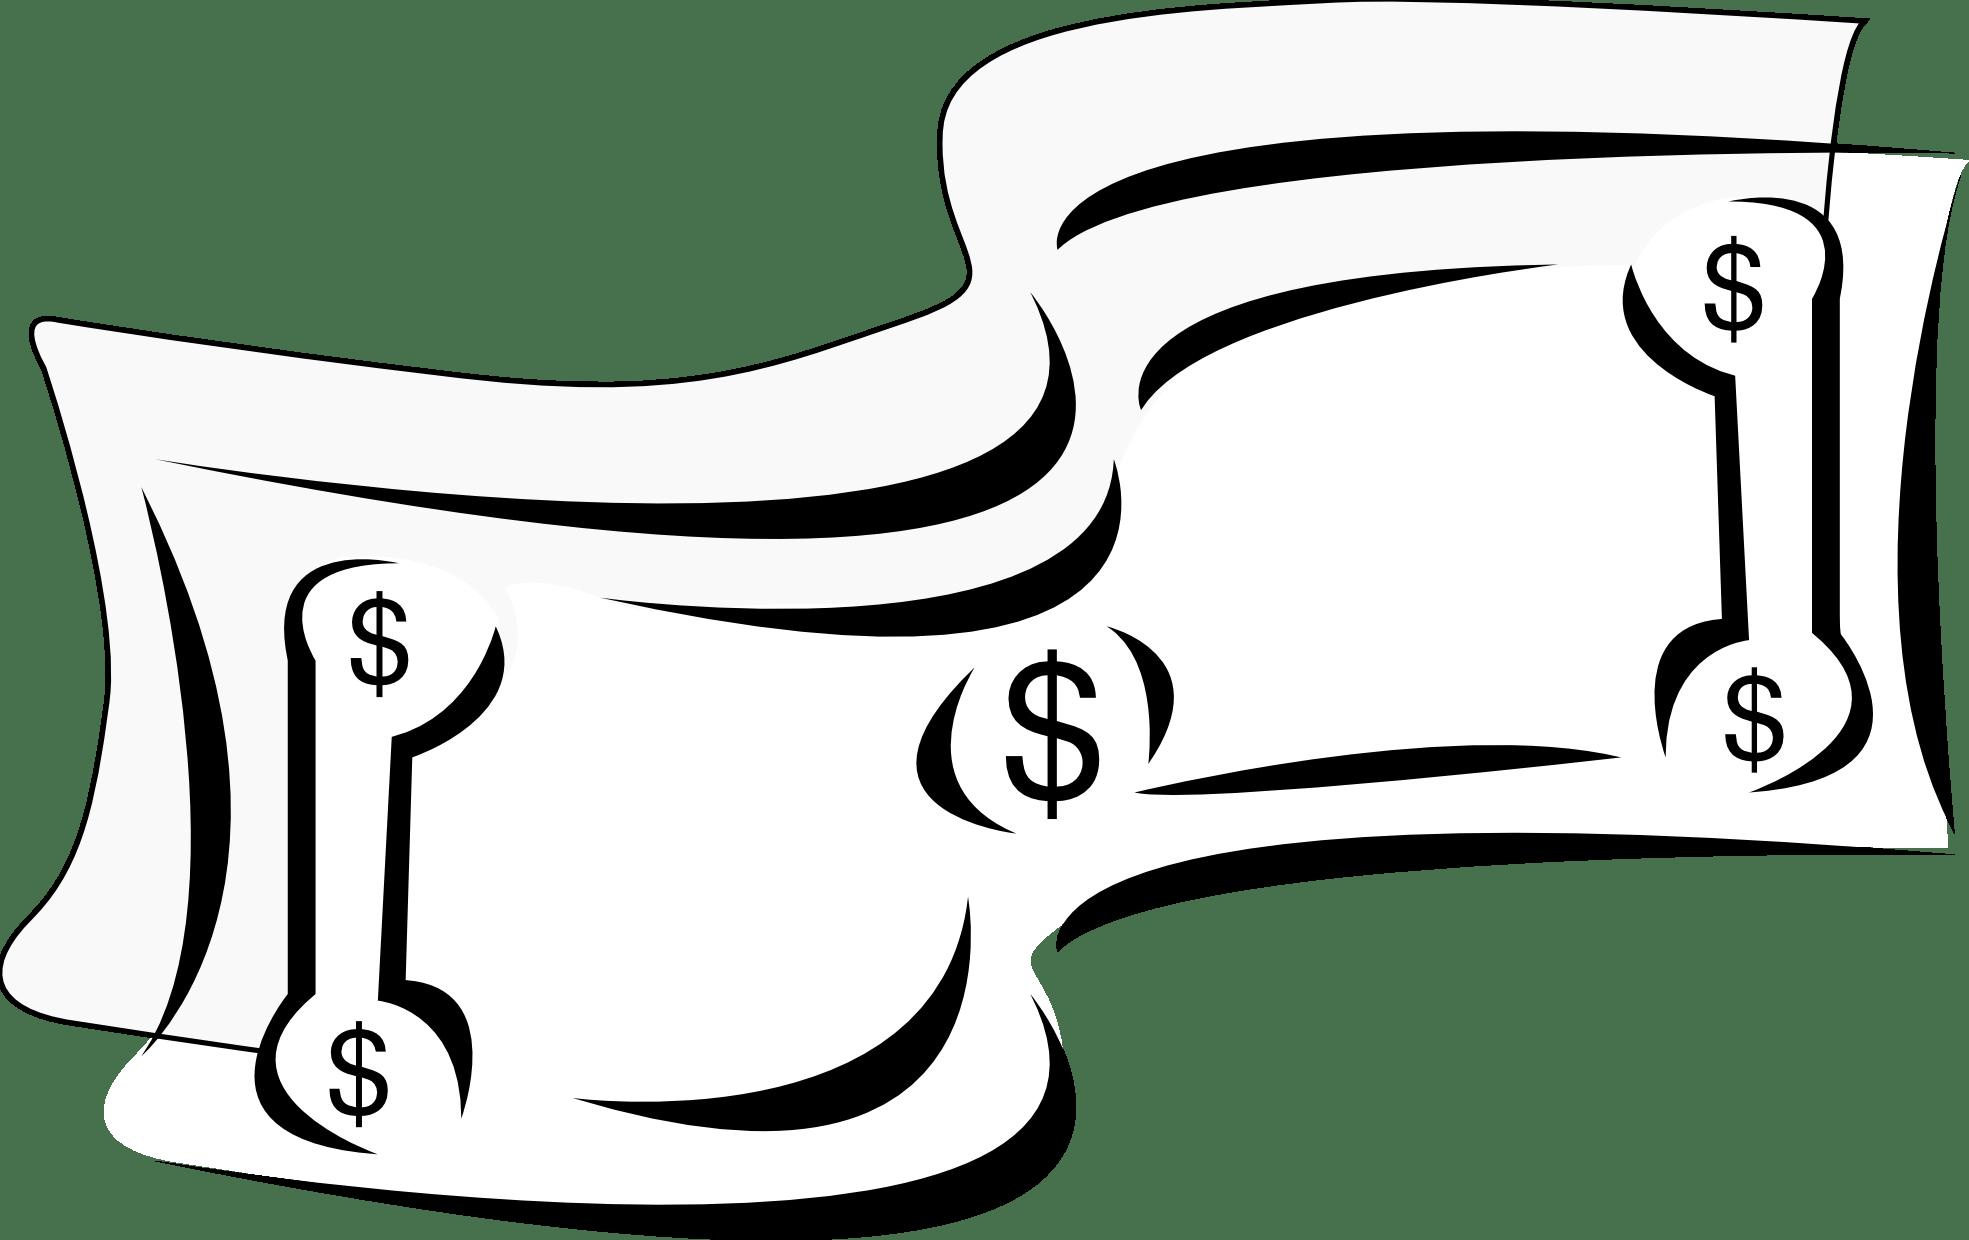 Dollar Bill Clip Art Black And White